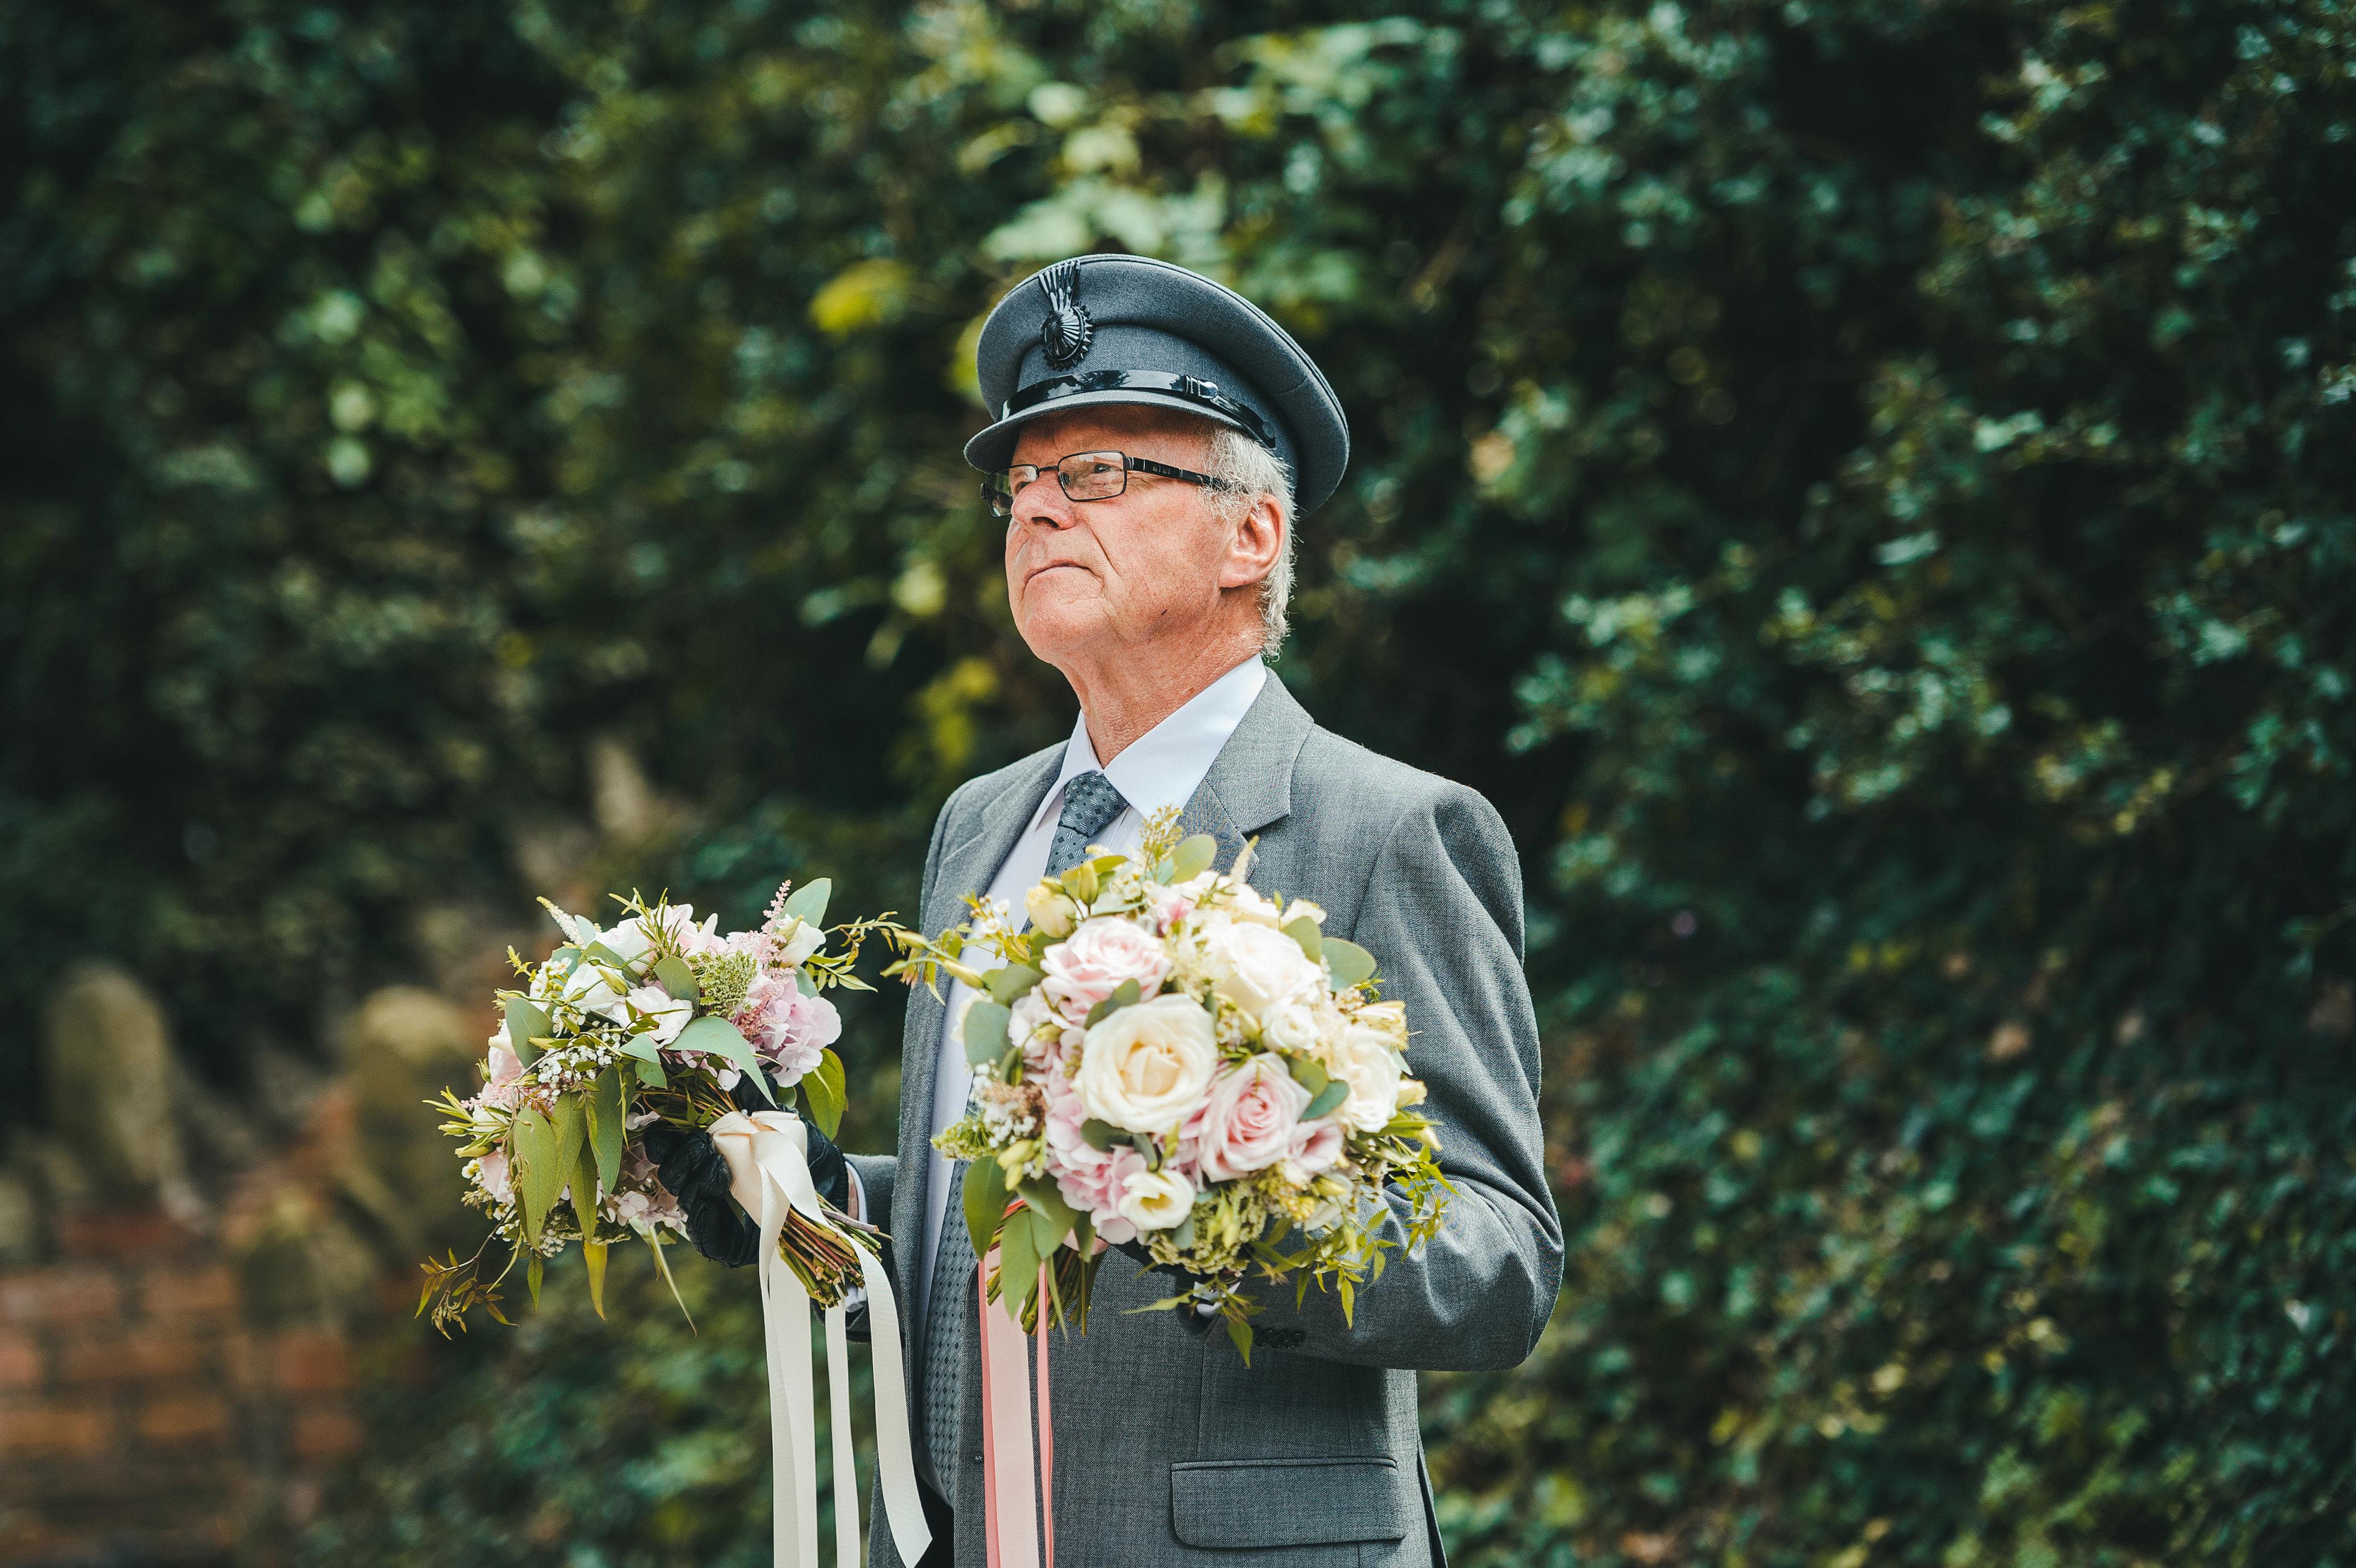 Helen & Andrew 2 designer wedding dresses by Caroline Castigliano